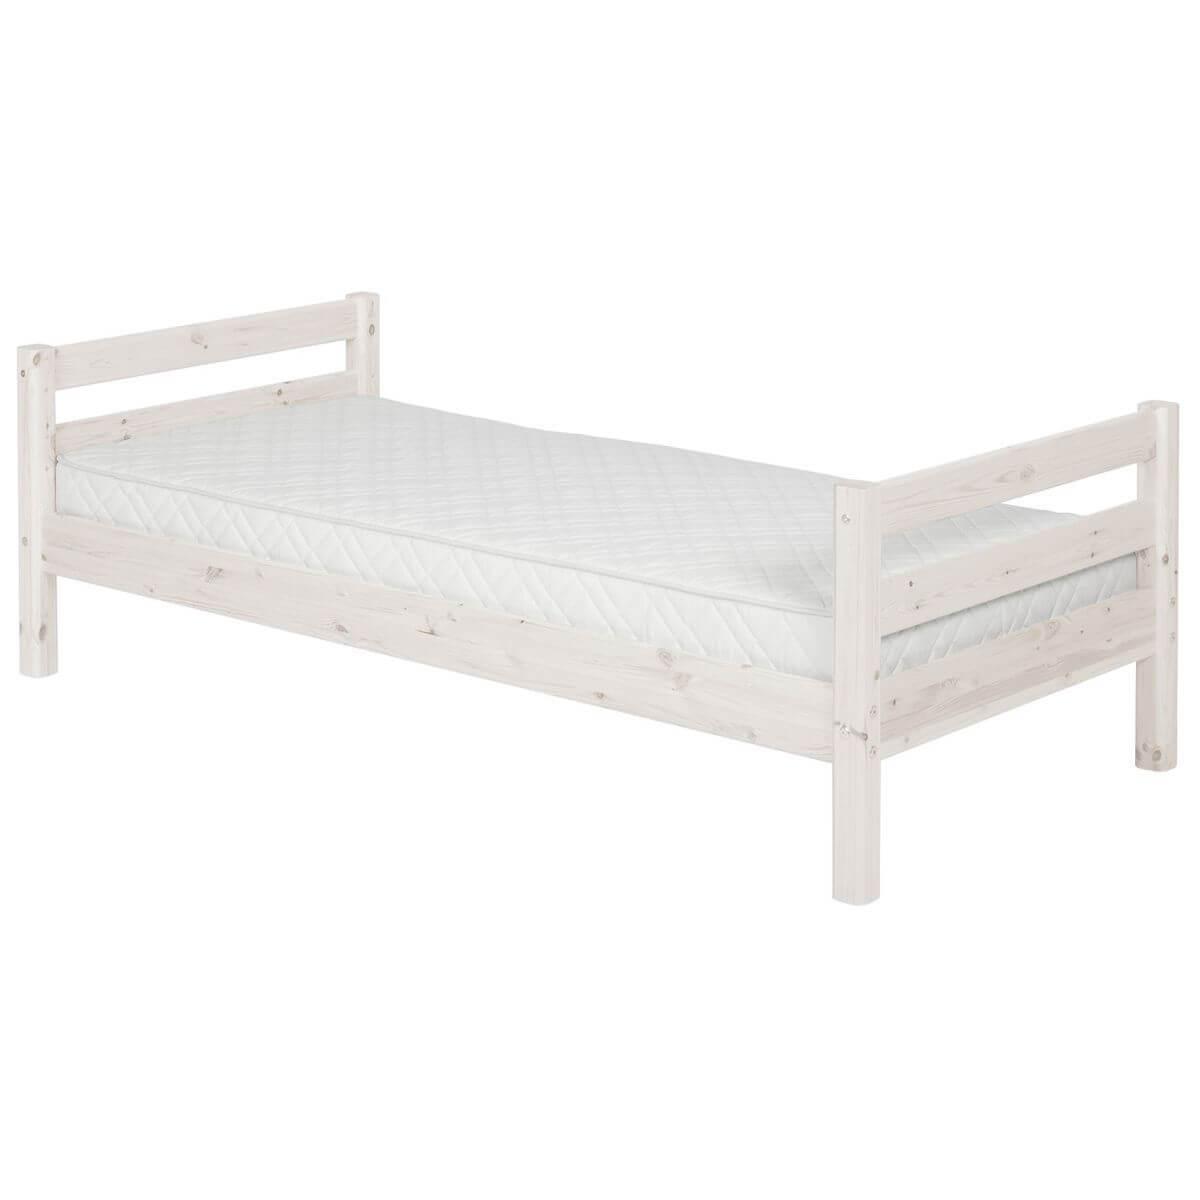 Cama somier 90x200 CLASSIC Flexa blanco cal